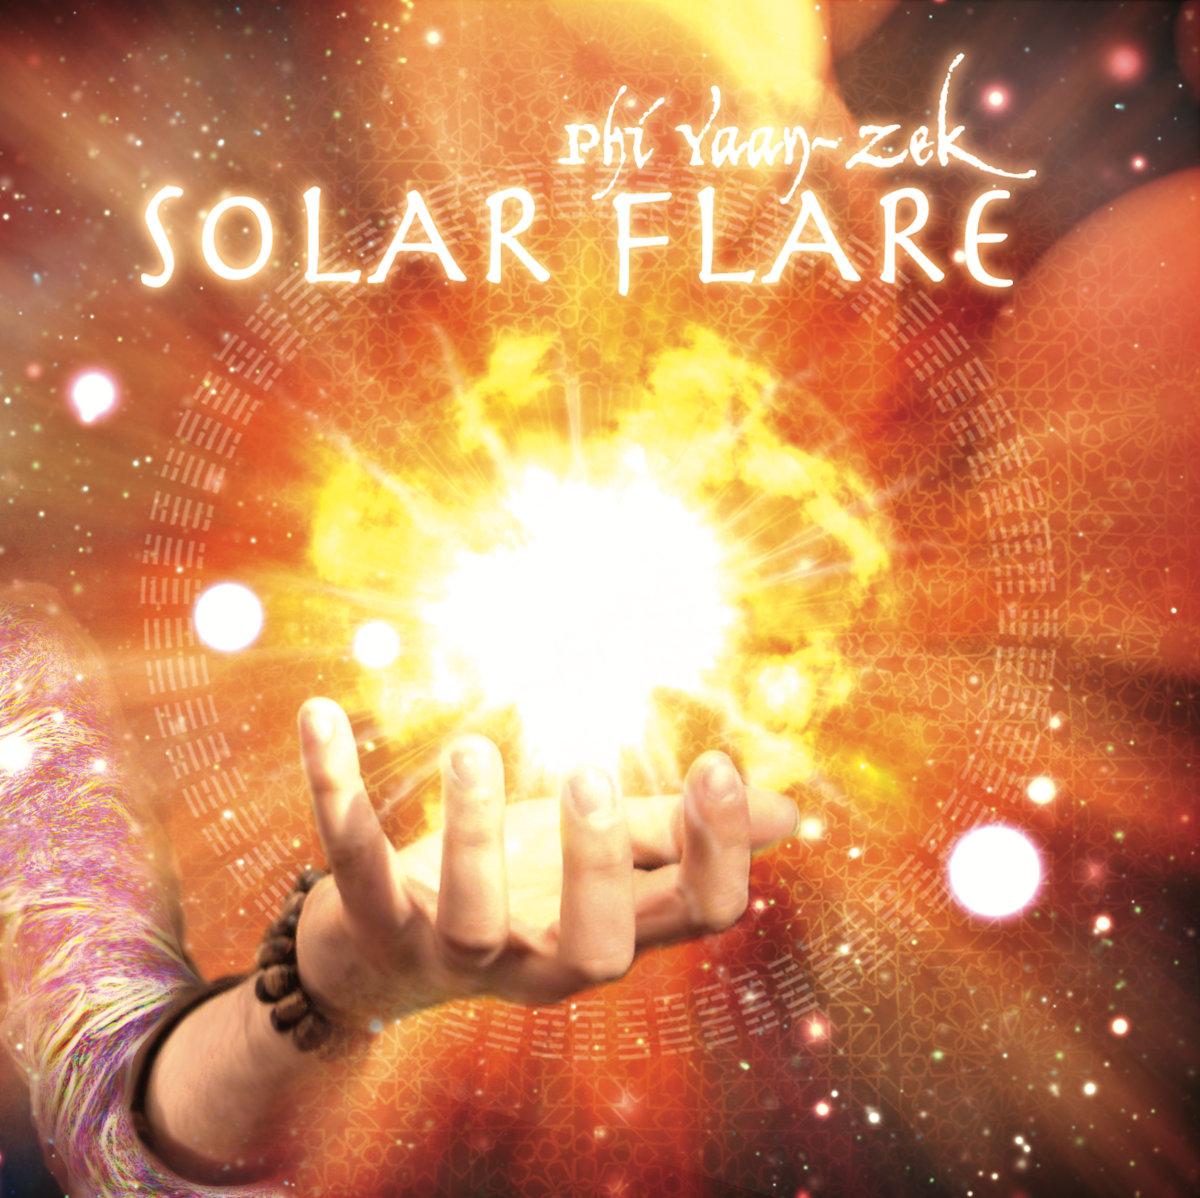 Phi Yaan-Zek — Solar Flare